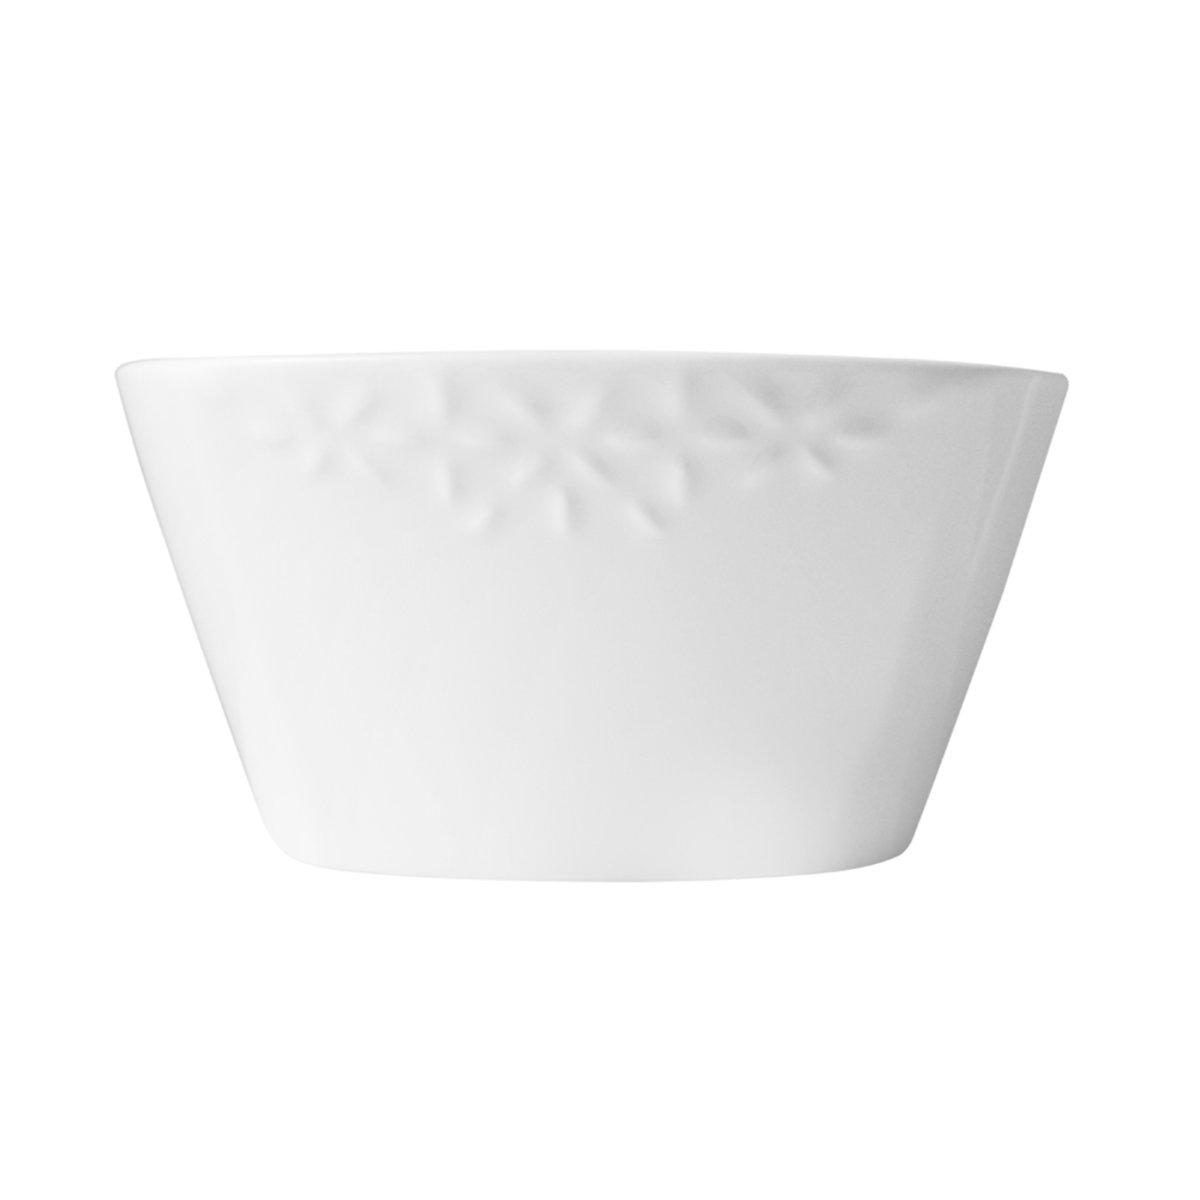 Bowl Tazon Redondo Porcelana 6 In Blanco Crown Baccara